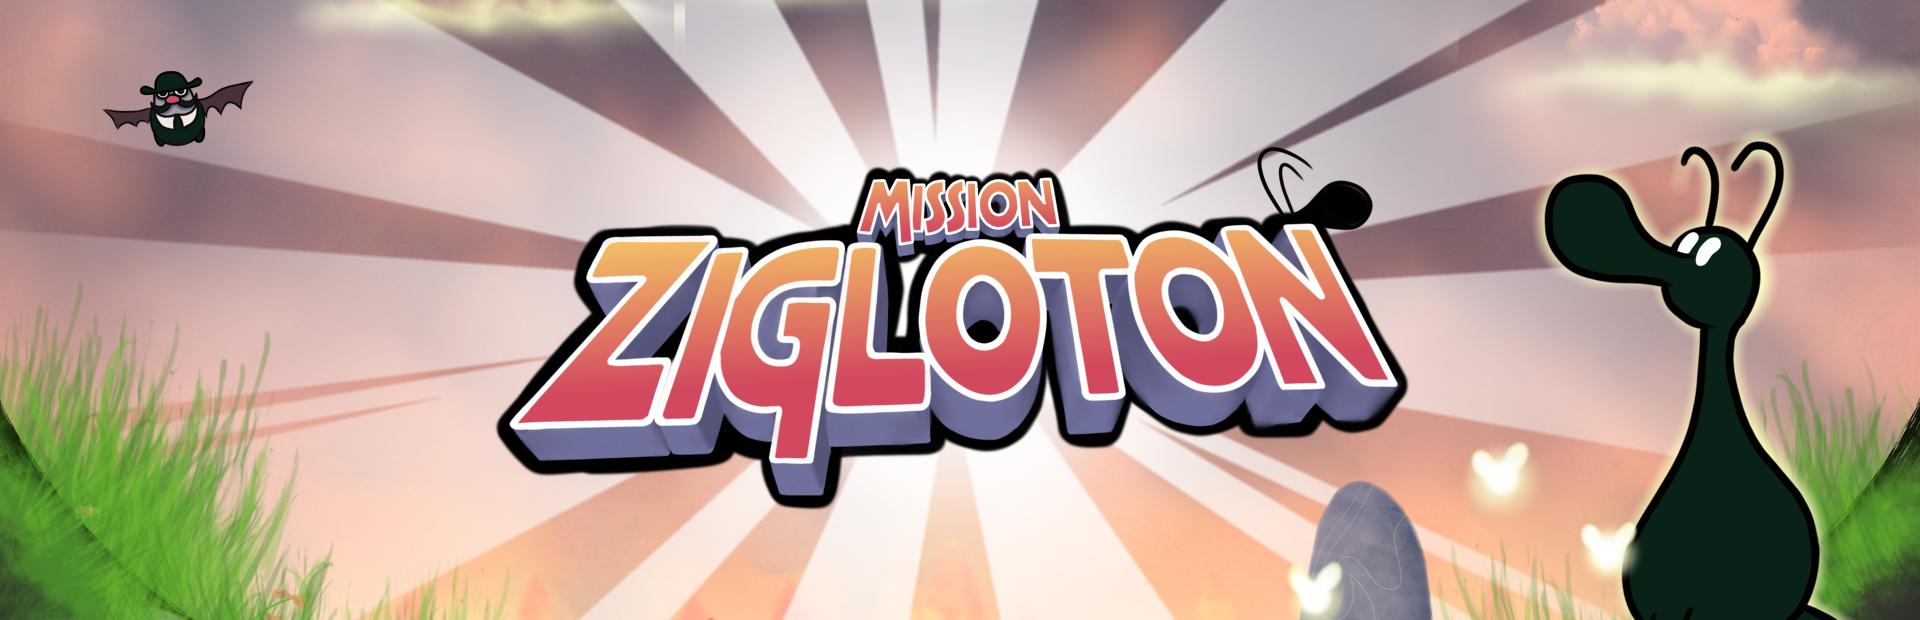 Mission Zigloton